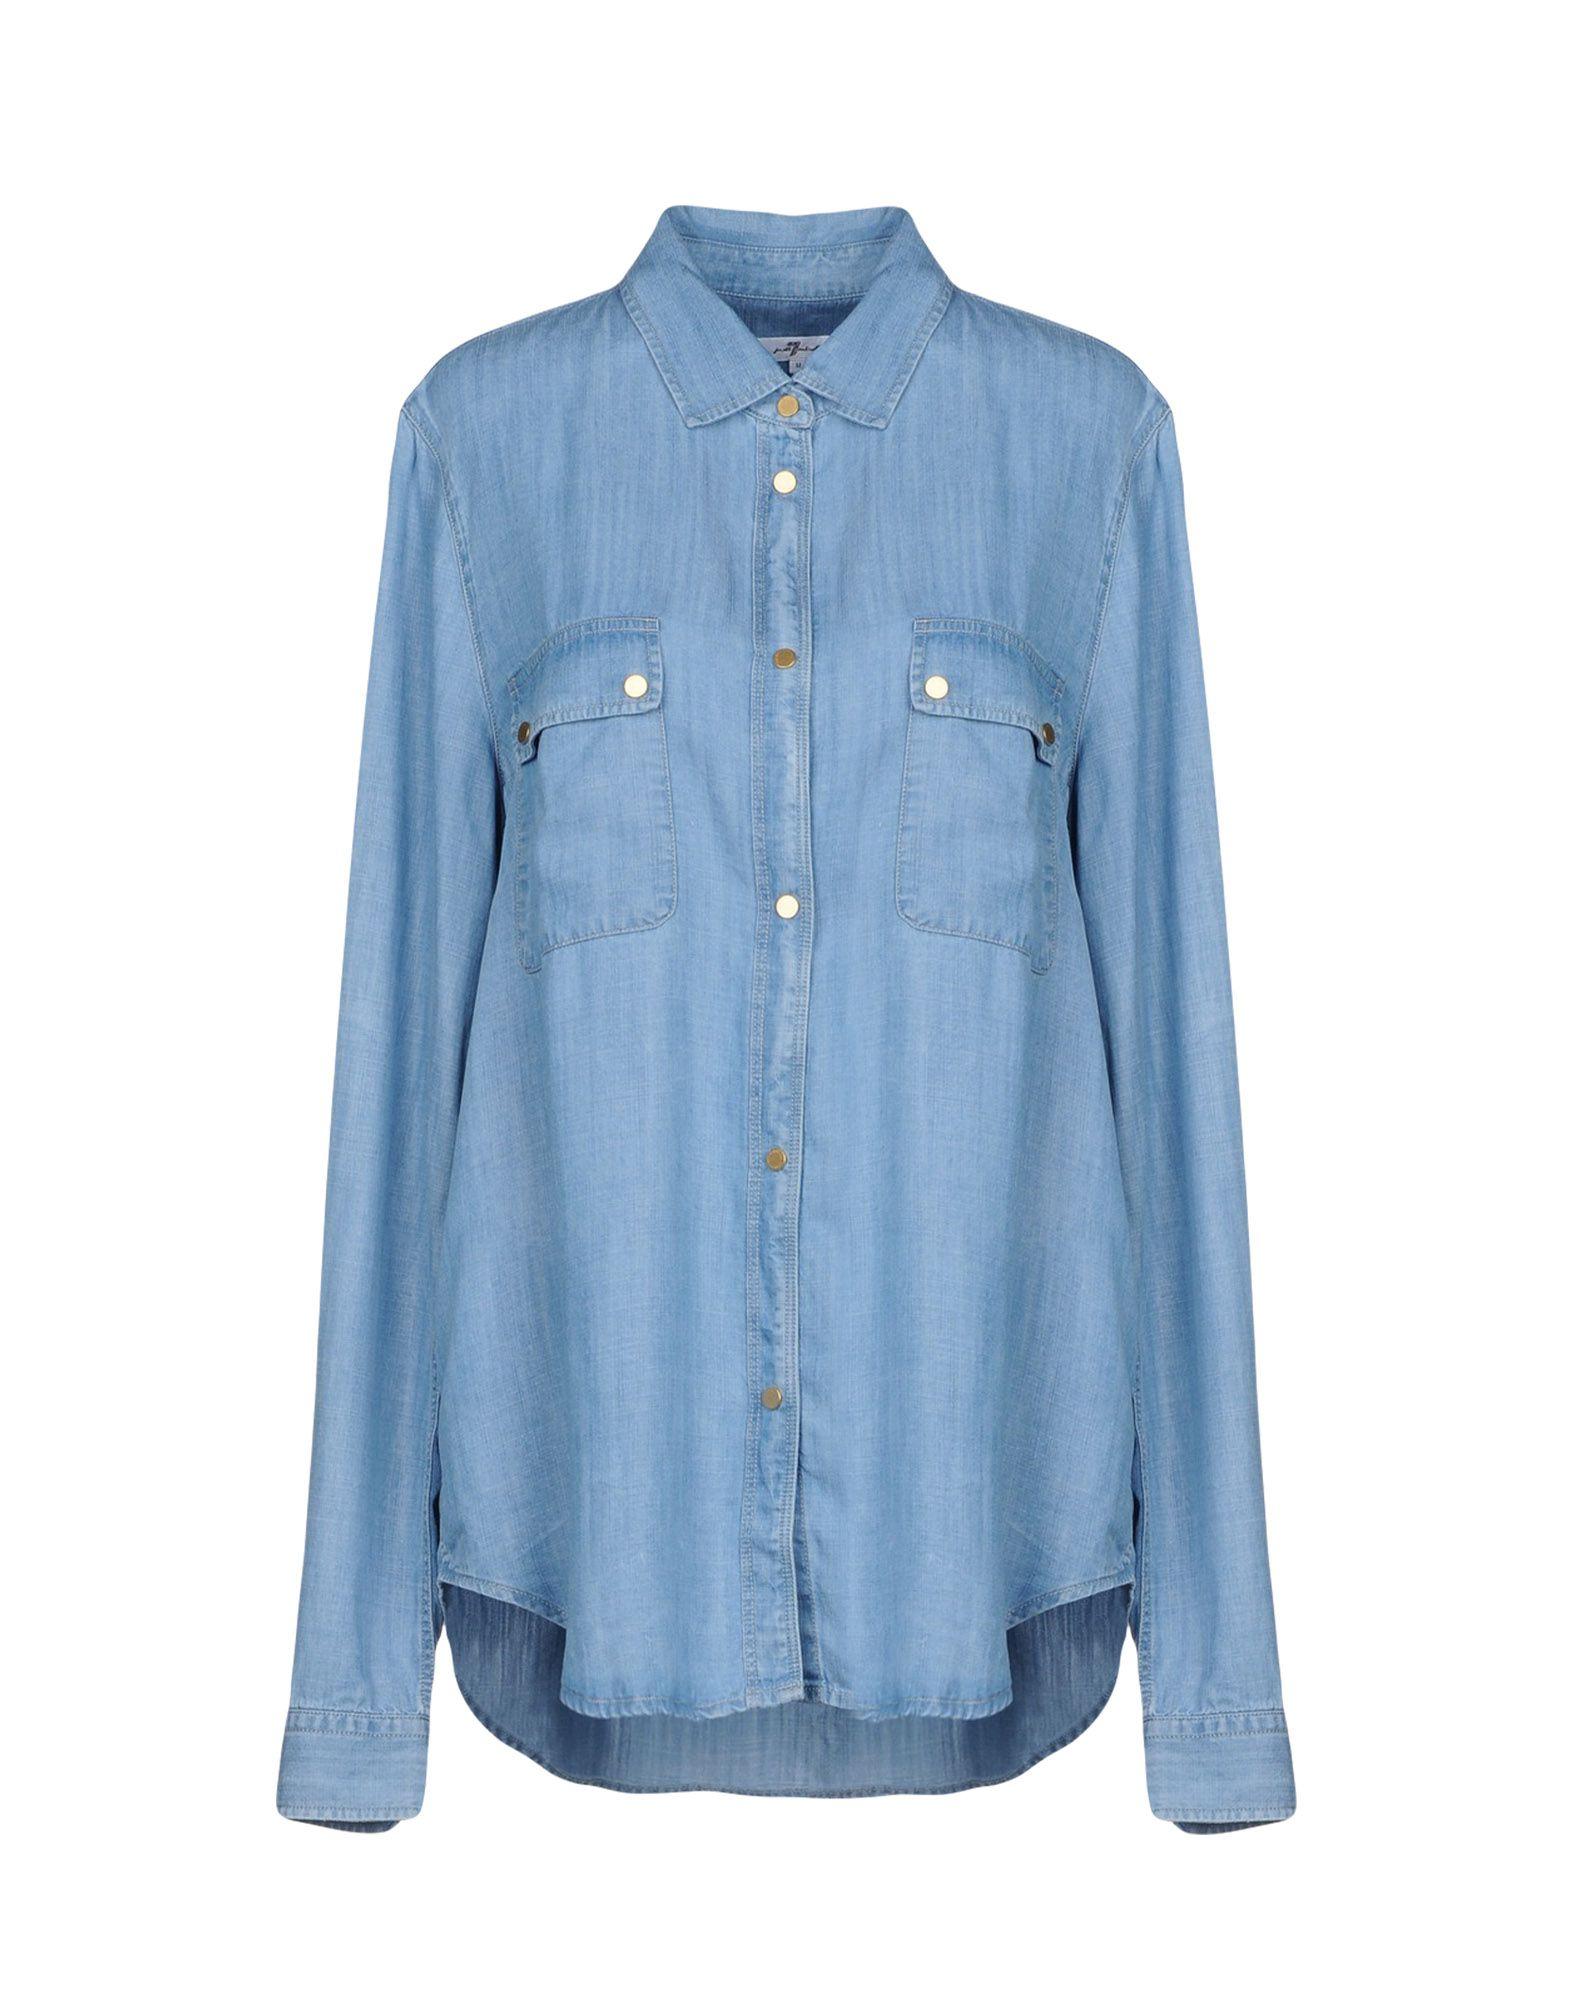 7 FOR ALL MANKIND Джинсовая рубашка 7 for all mankind джинсовая верхняя одежда